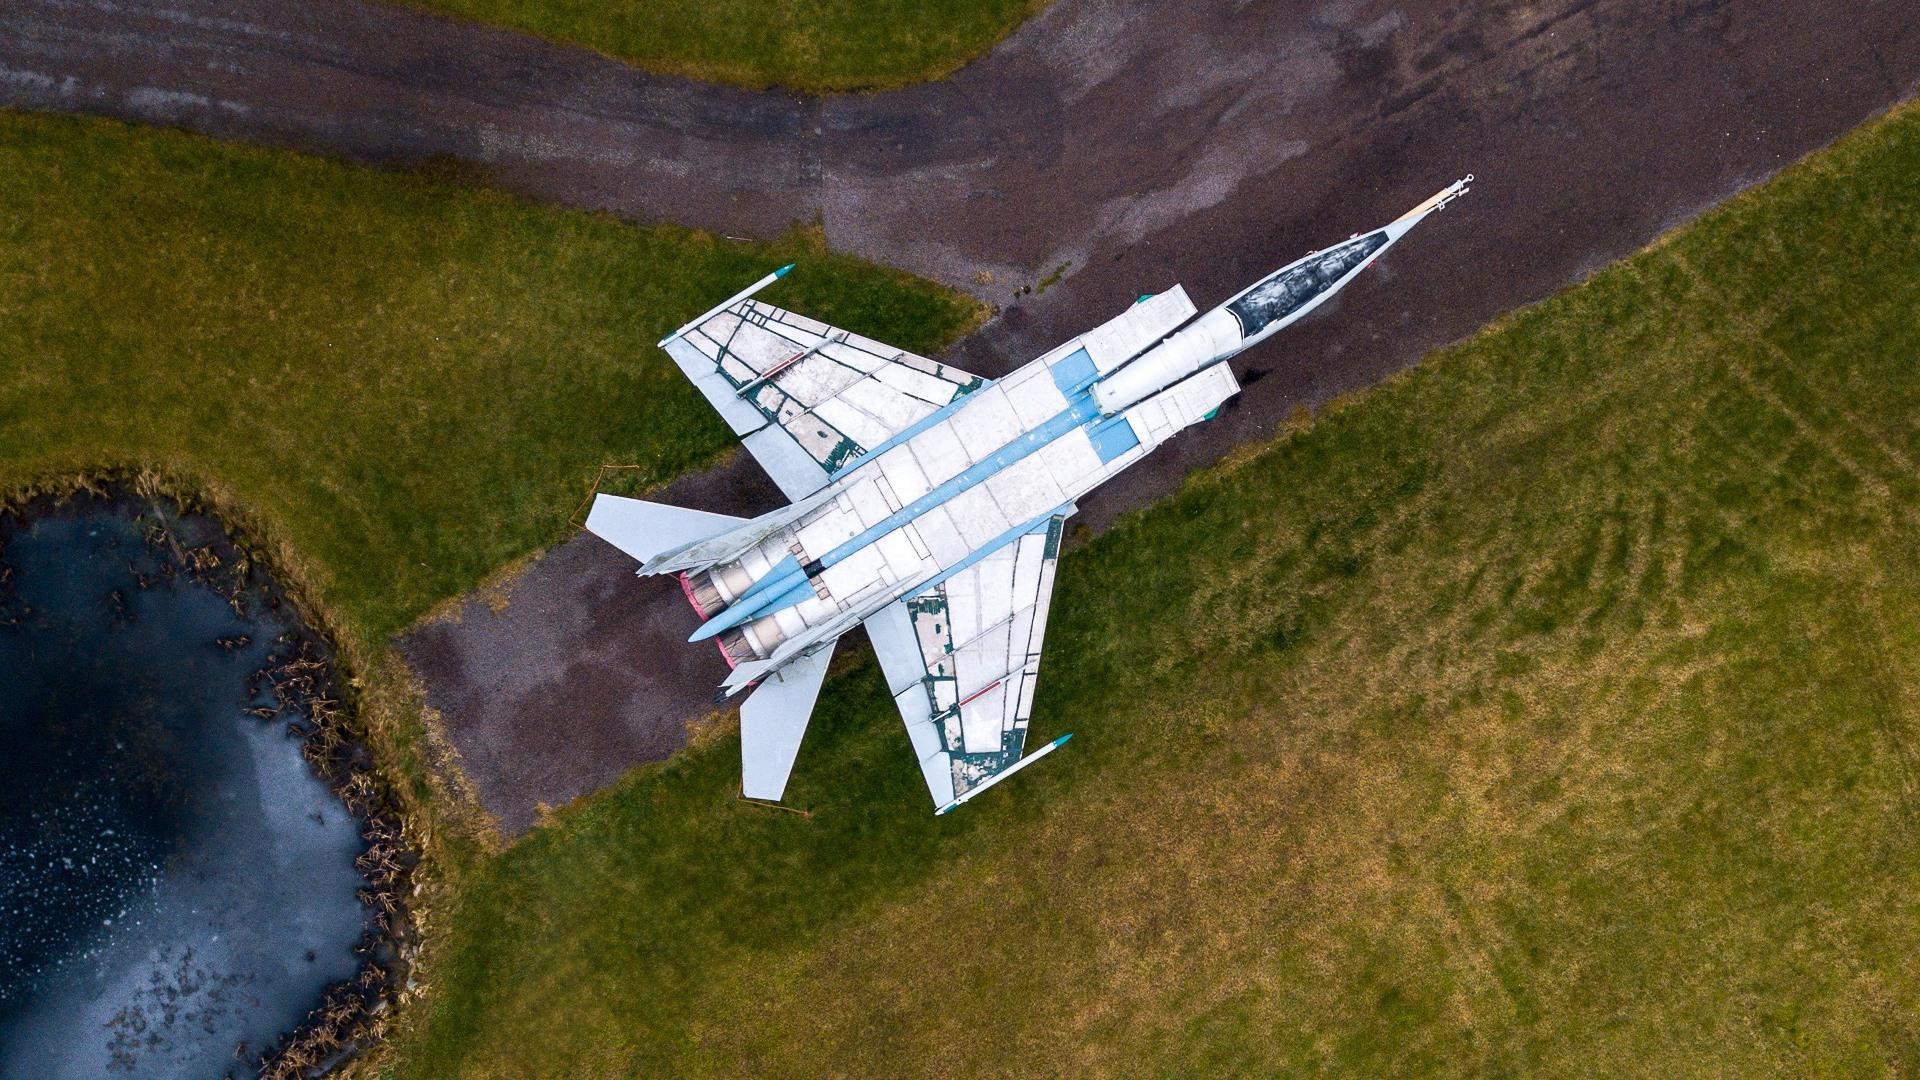 Wallpaper MiG 25 Fighter top view runway 1920x1080 Full HD 2K 1920x1080